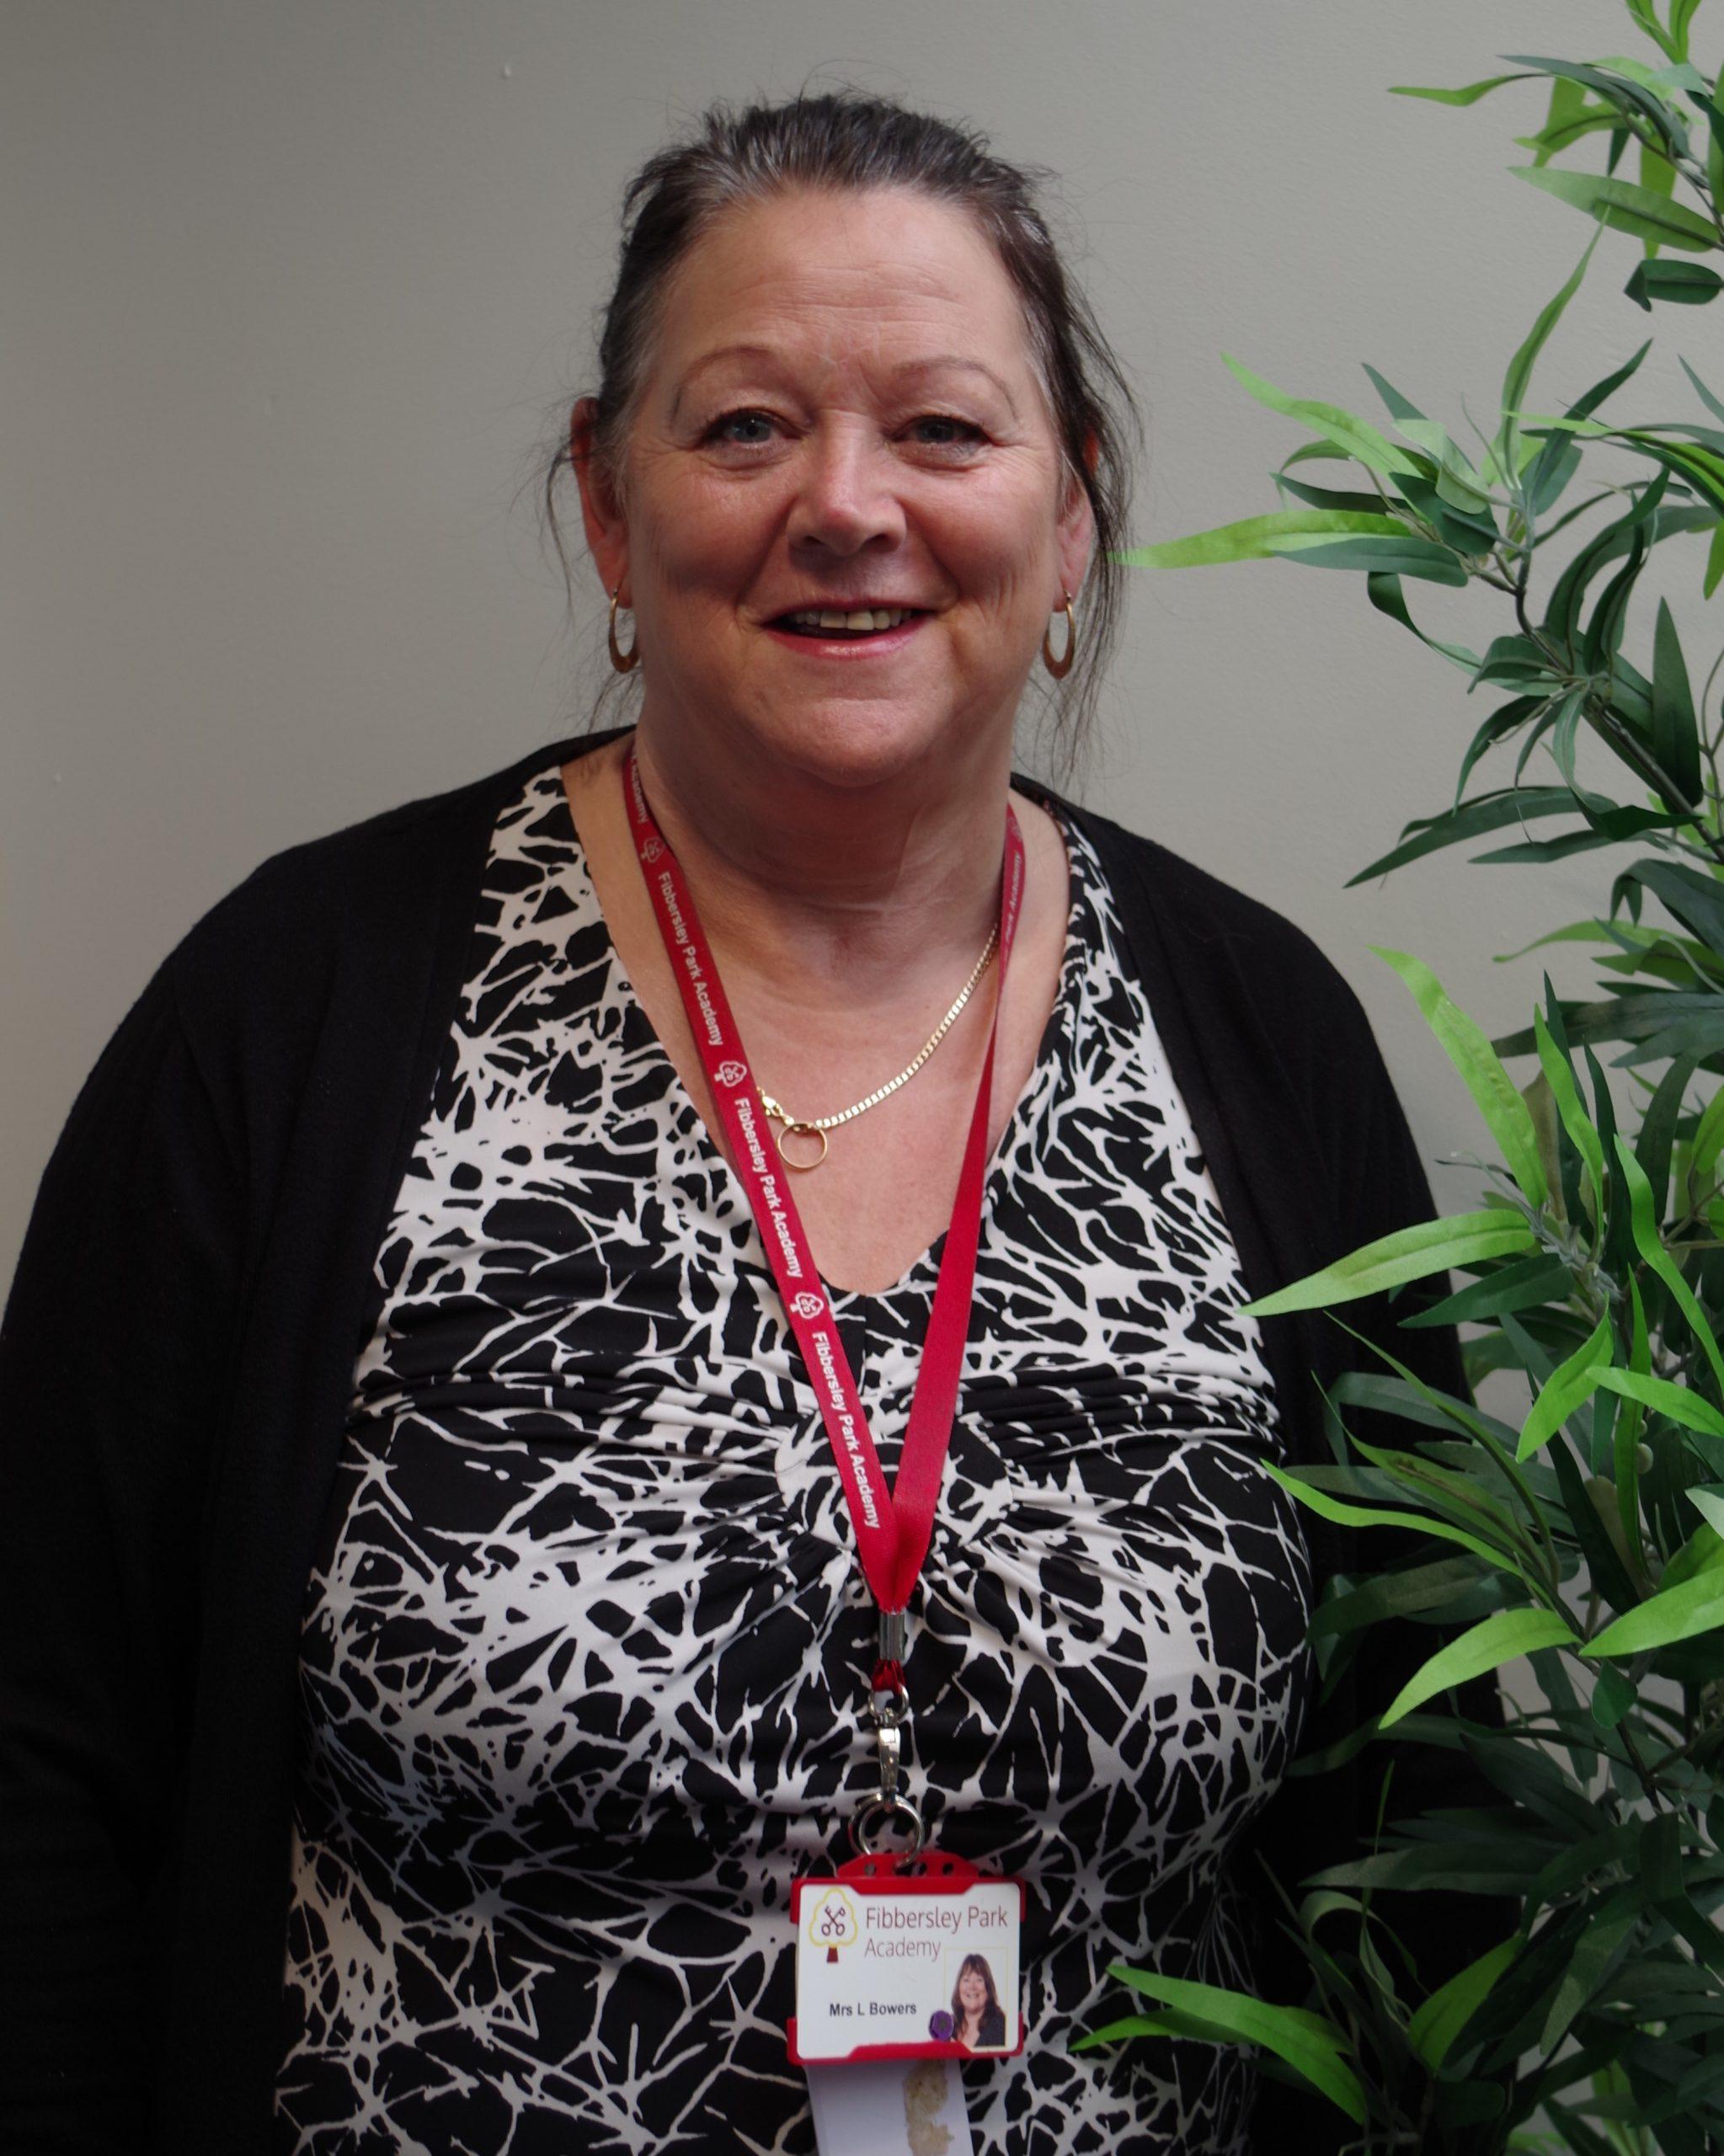 Mrs L. Bowers